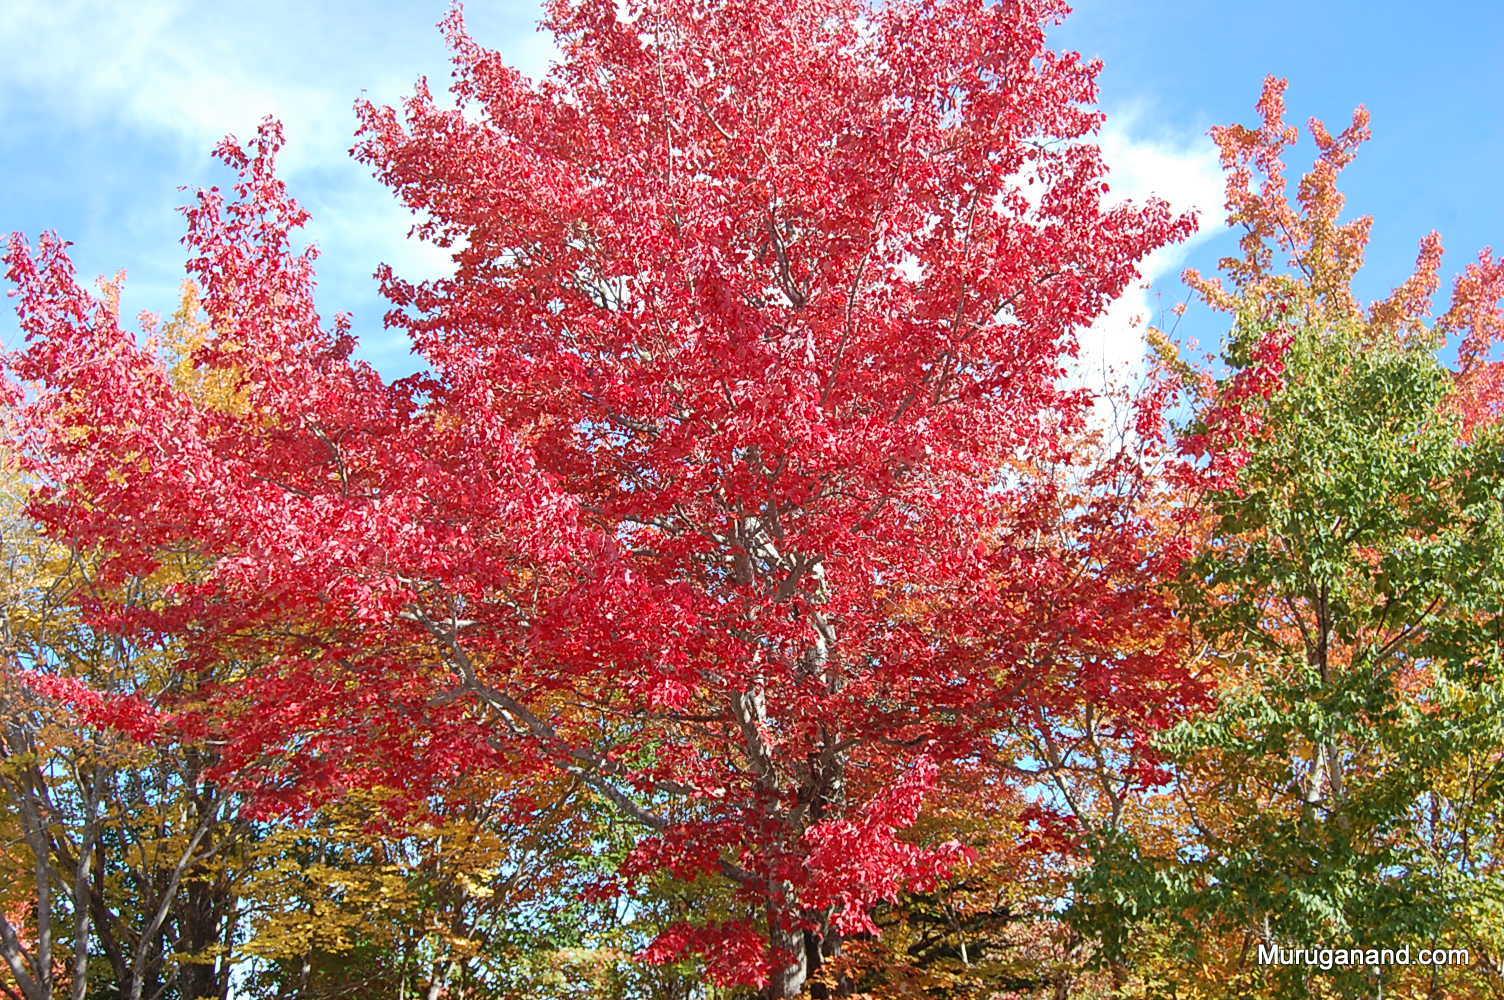 Maple trees are vibrant.